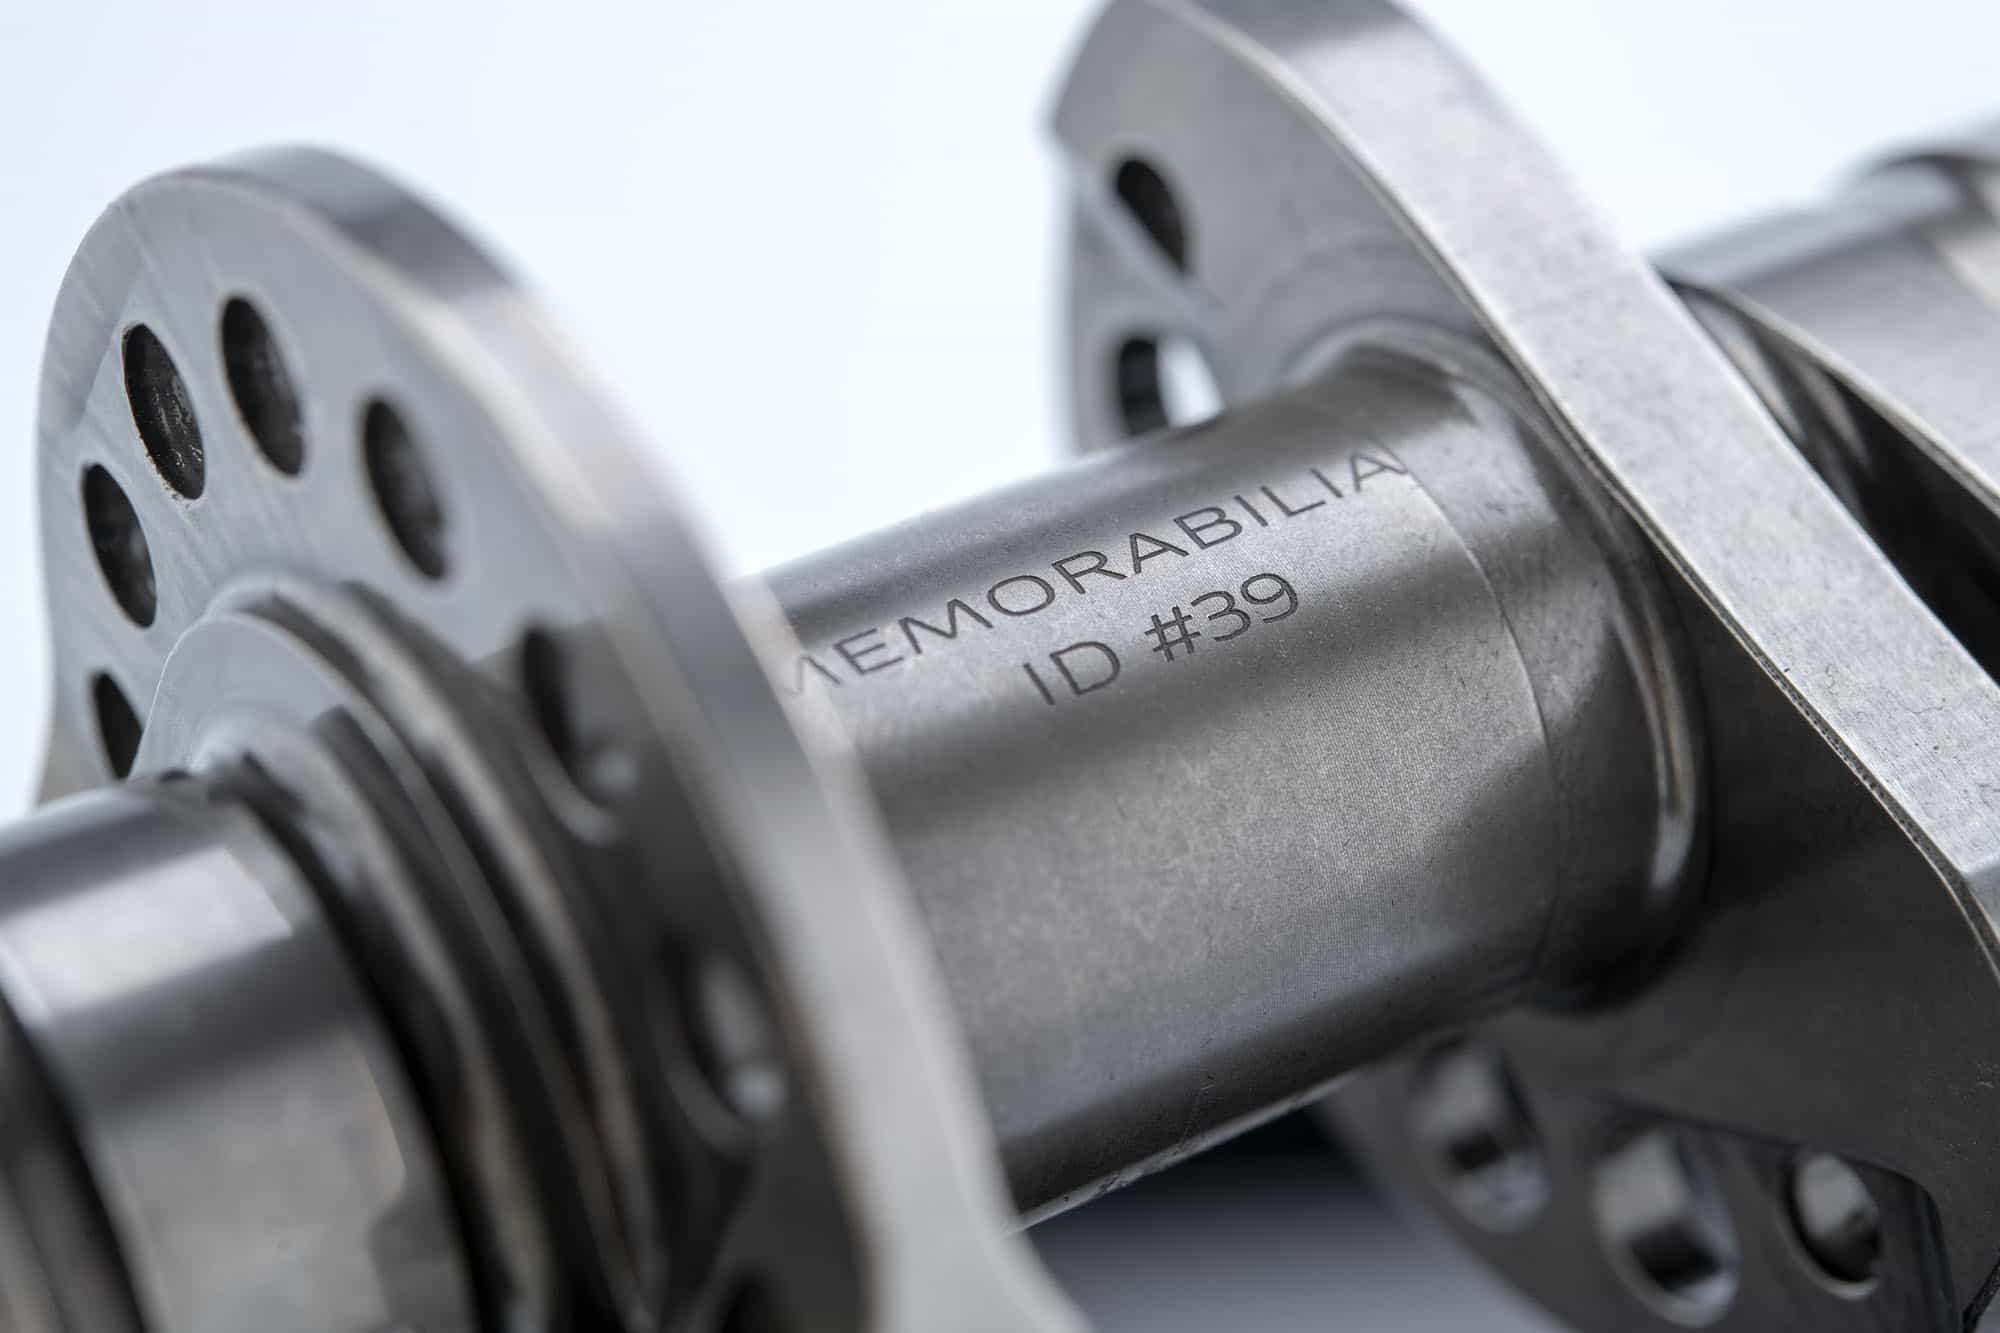 Ducati MotoGP/WSBK車両のエンジンパーツをコレクターズアイテムとしてDucati Memorabiliaの名前で販売